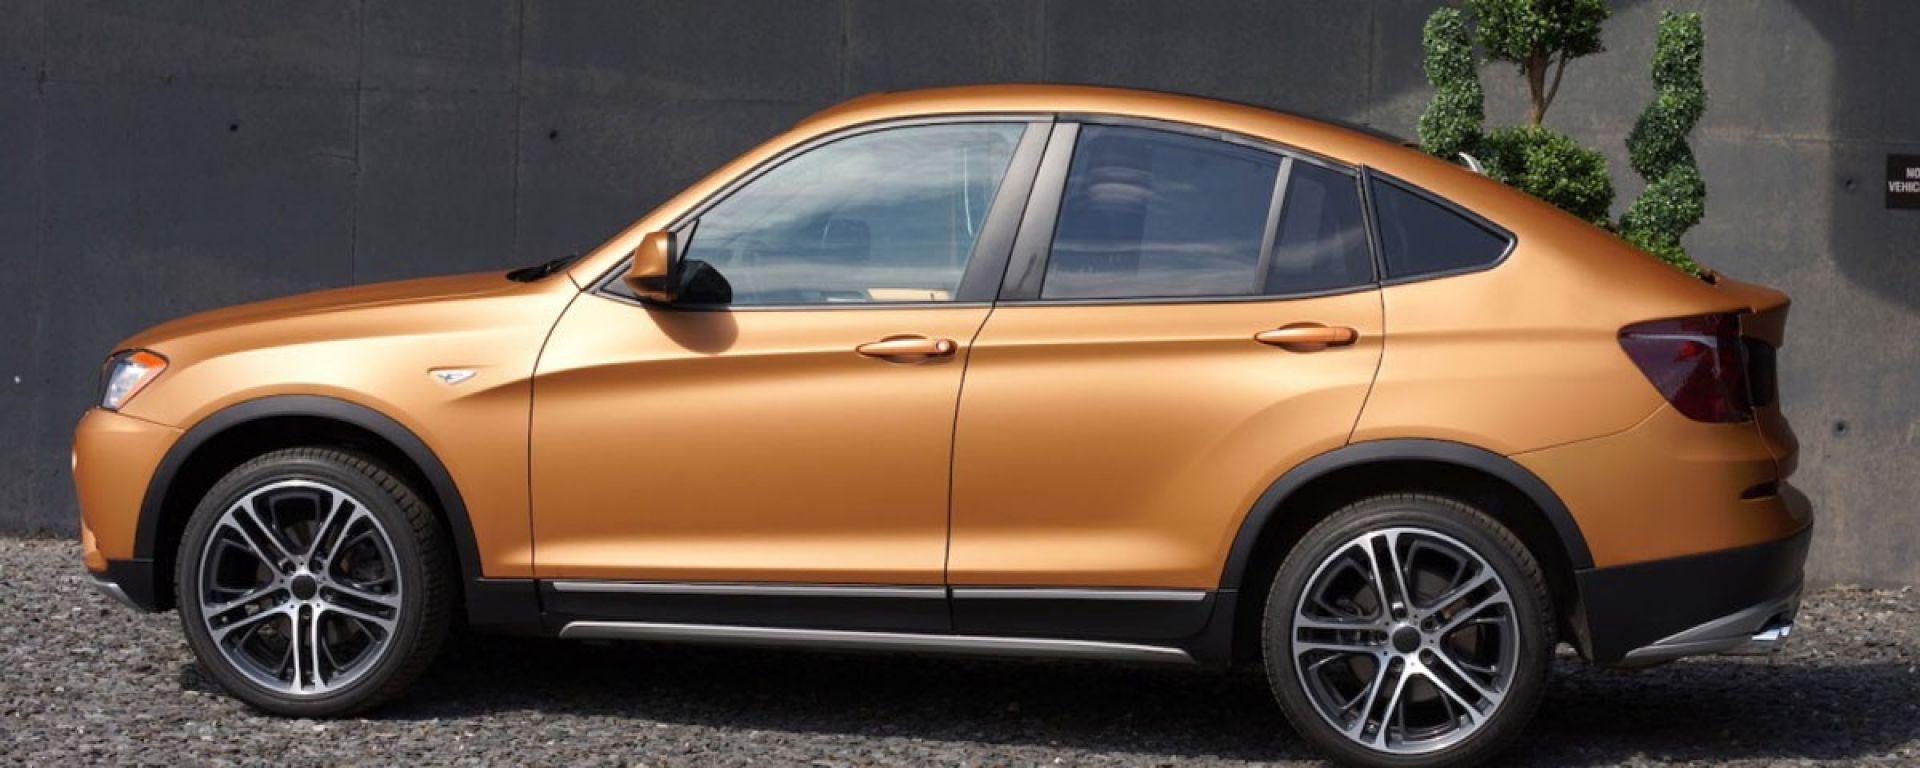 BMW Deep Orange 4